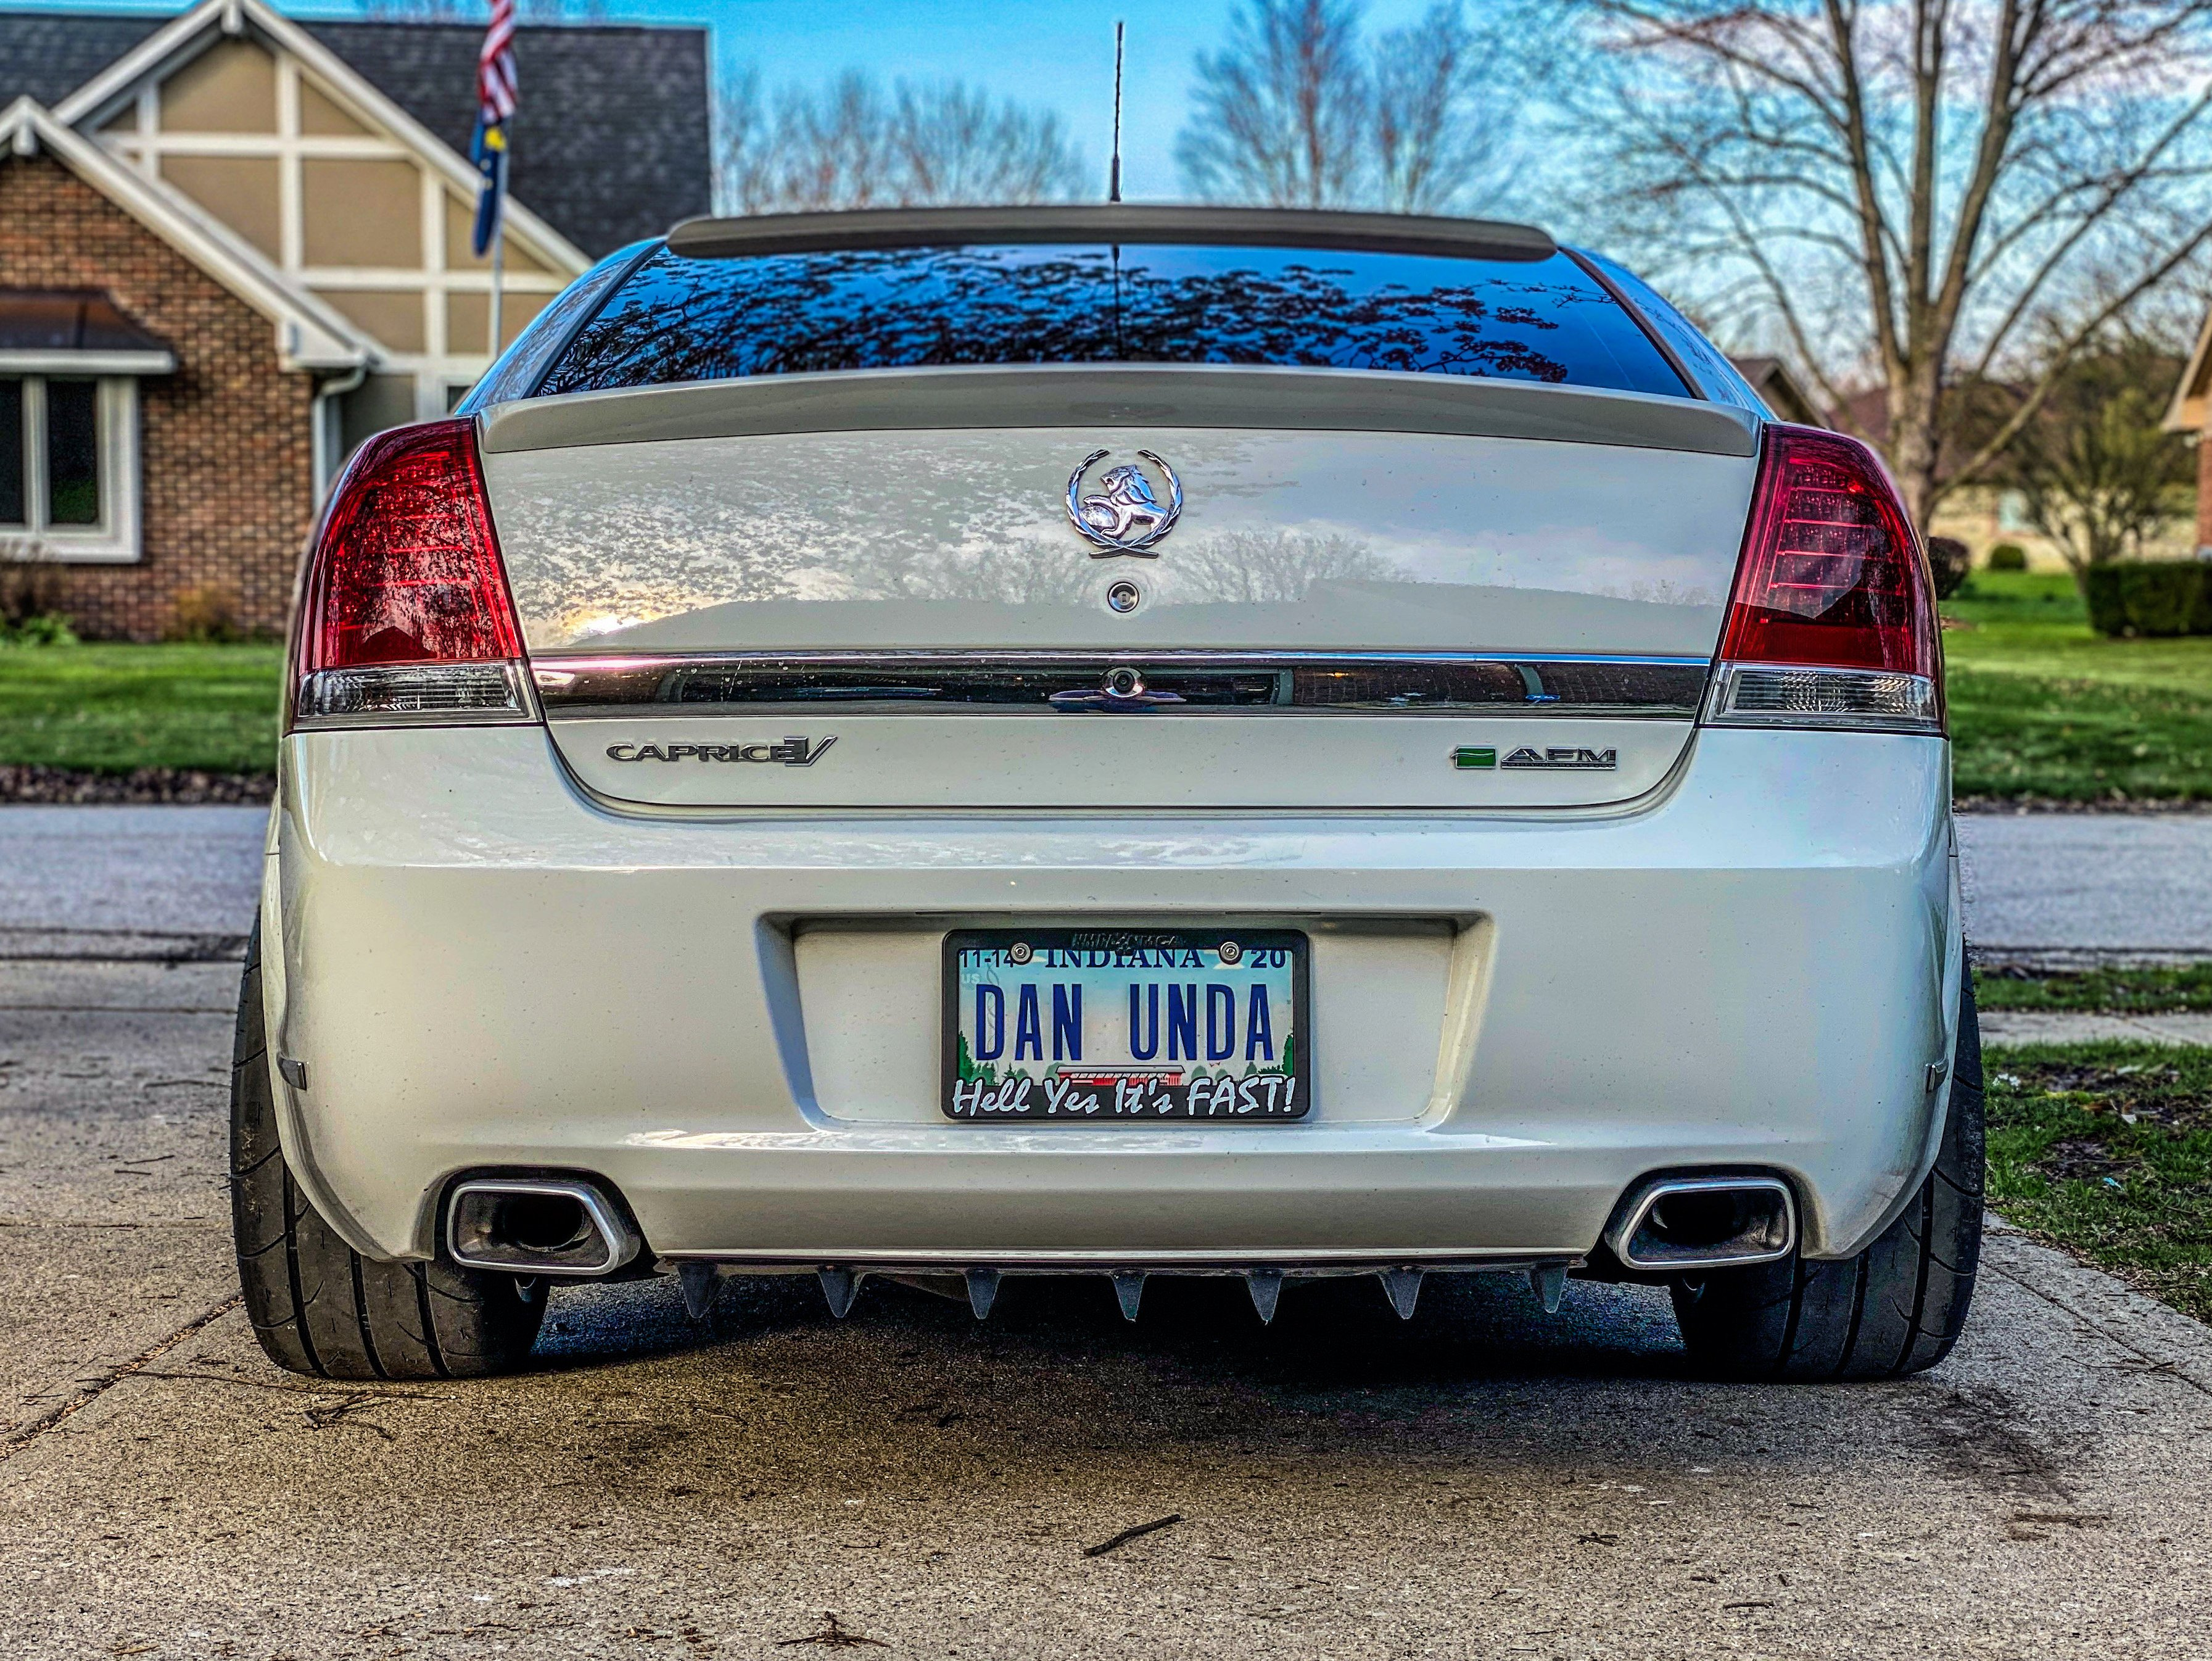 Tony S 2015 Chevrolet Caprice Holley My Garage